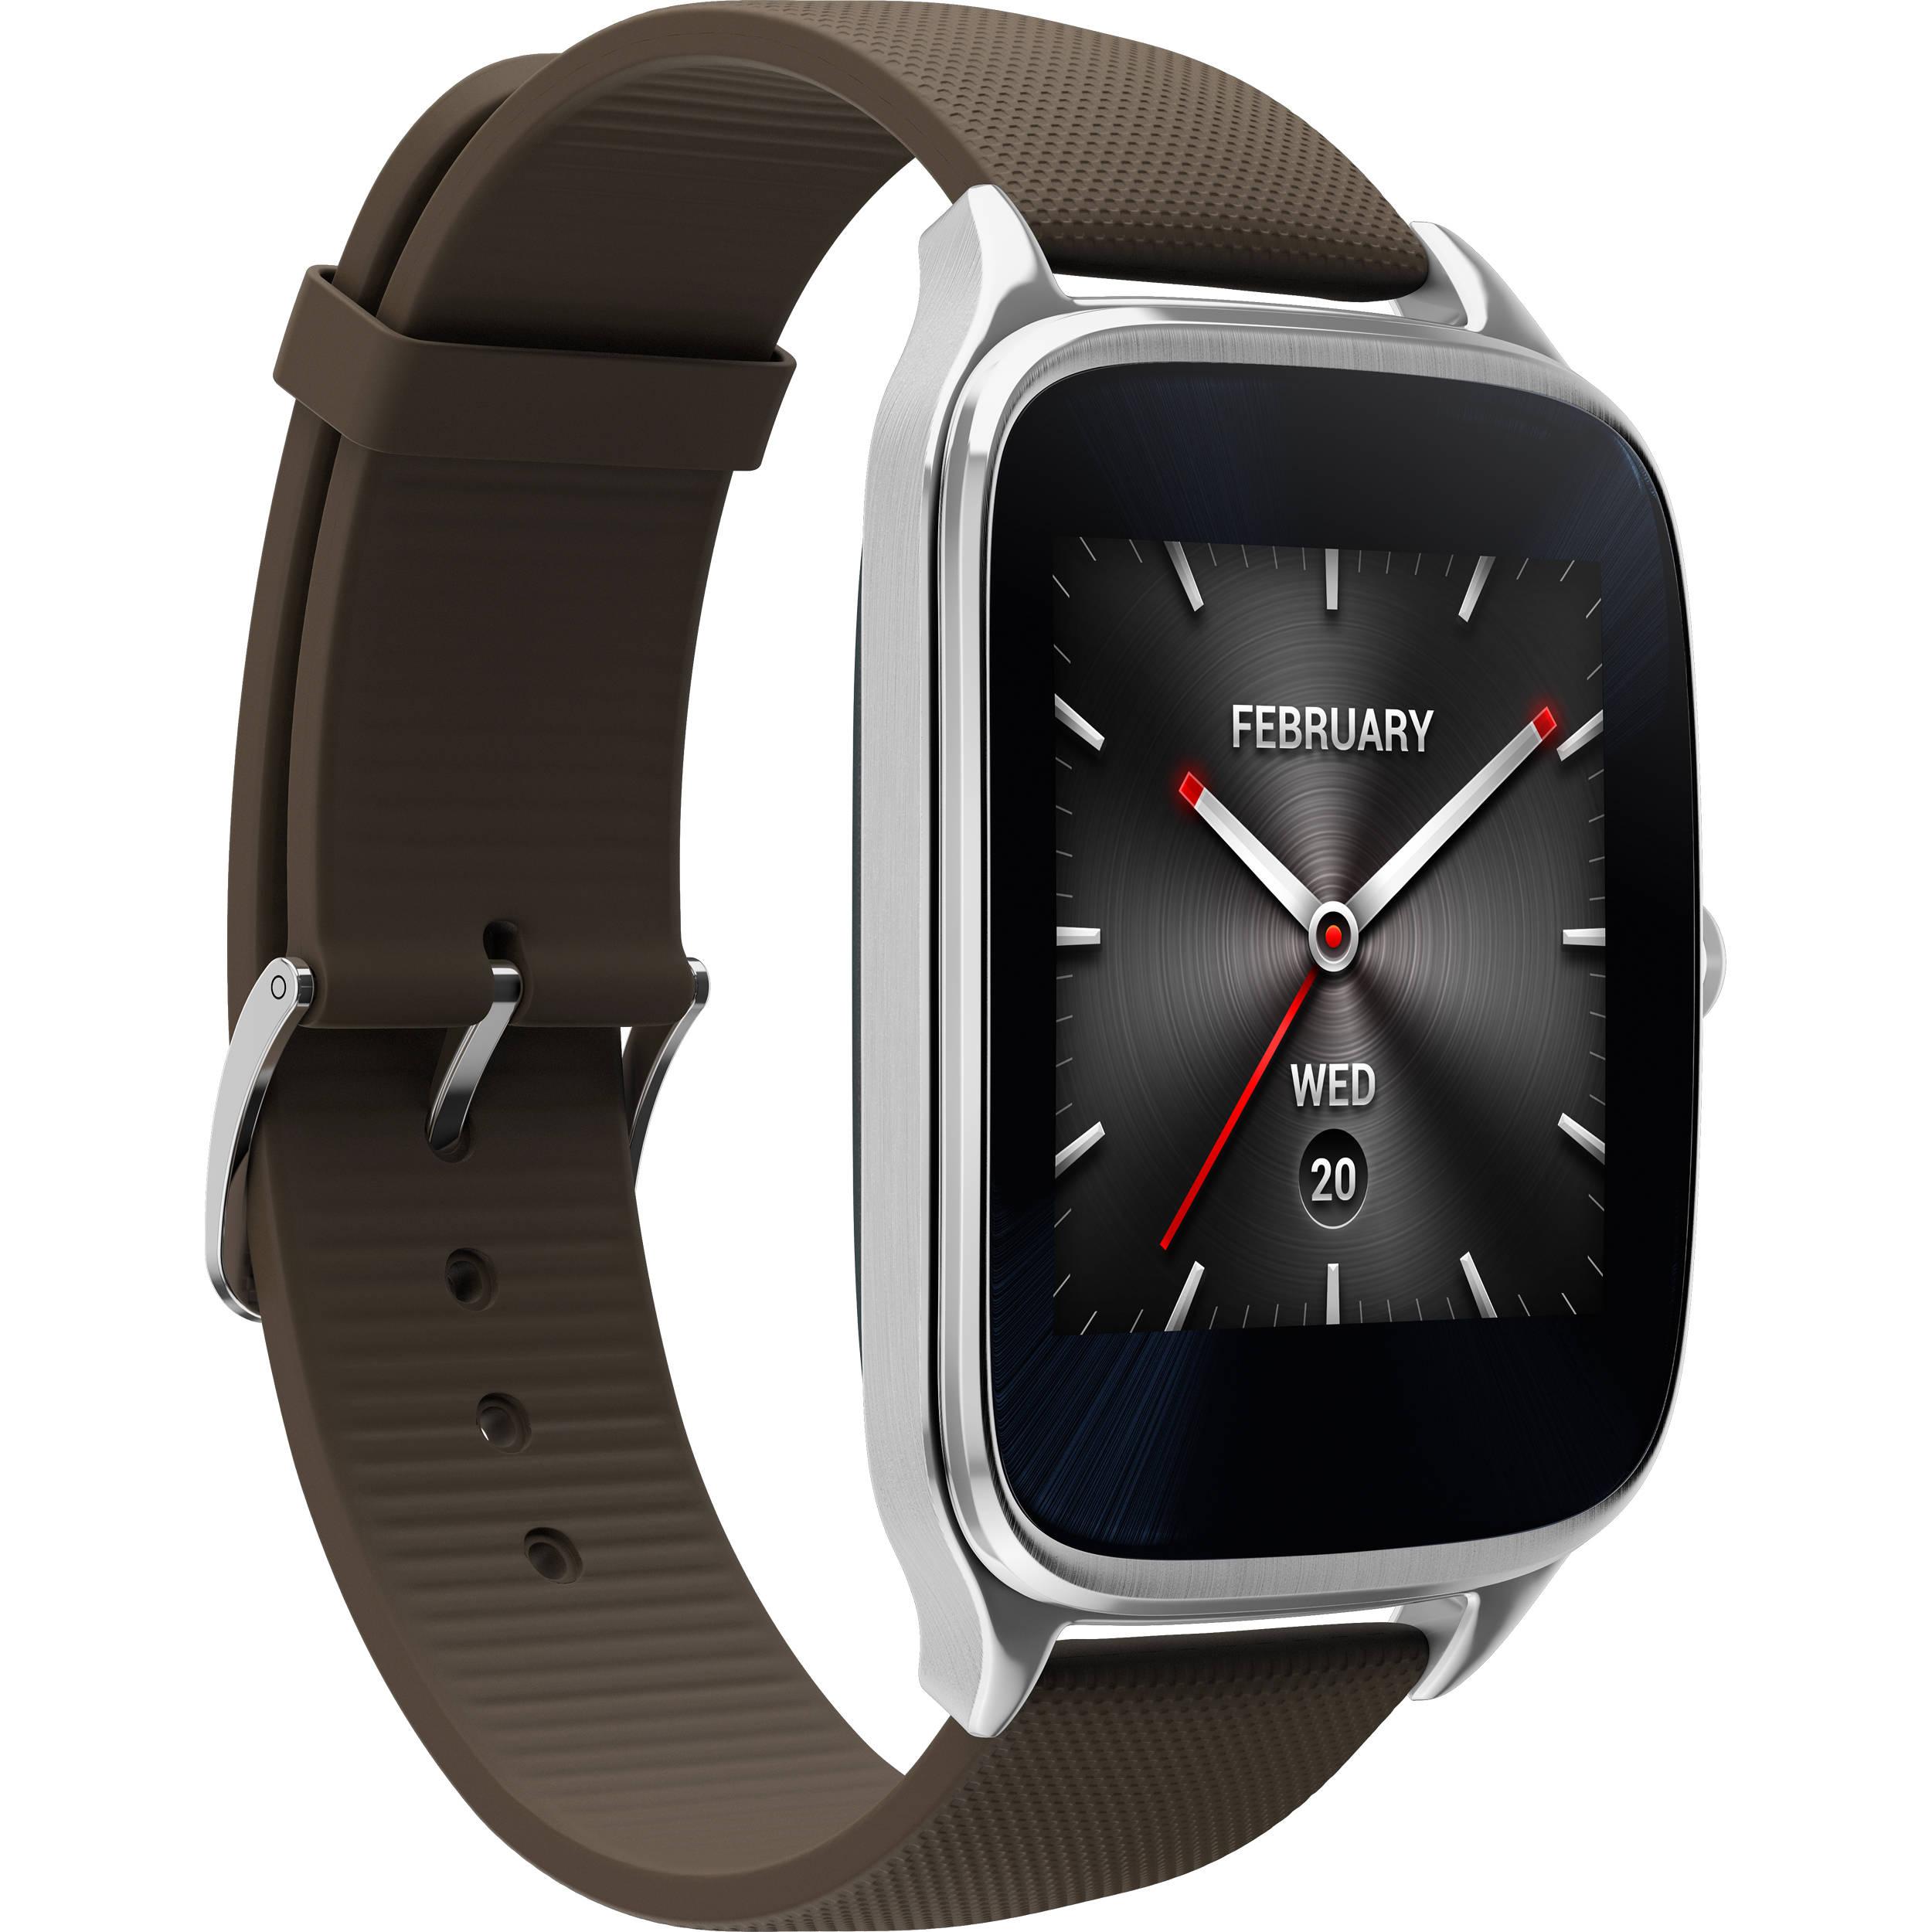 "ASUS ZenWatch 2 1.63"" Smartwatch WI501Q-SR-BW-Q B&H Photo"